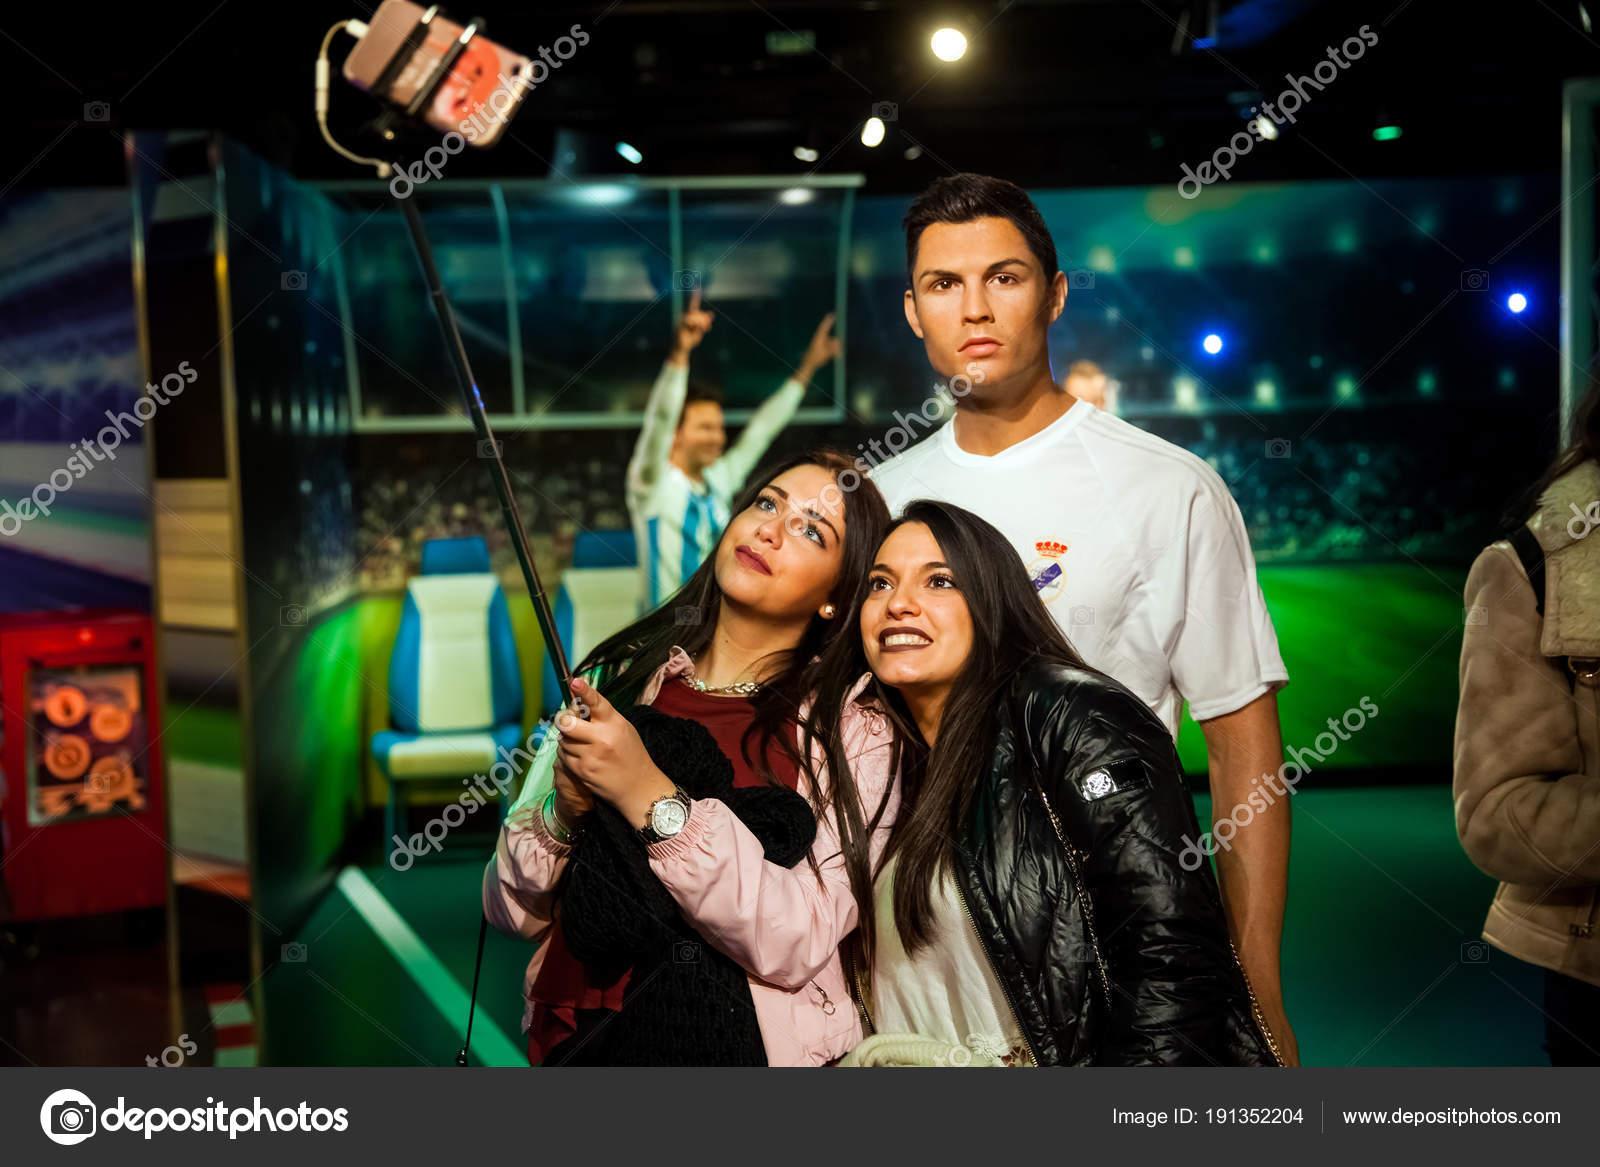 Museo Delle Cere Amsterdam.Wax Figure Of Cristiano Ronaldo Soccer Player In Madame Tussauds Wax